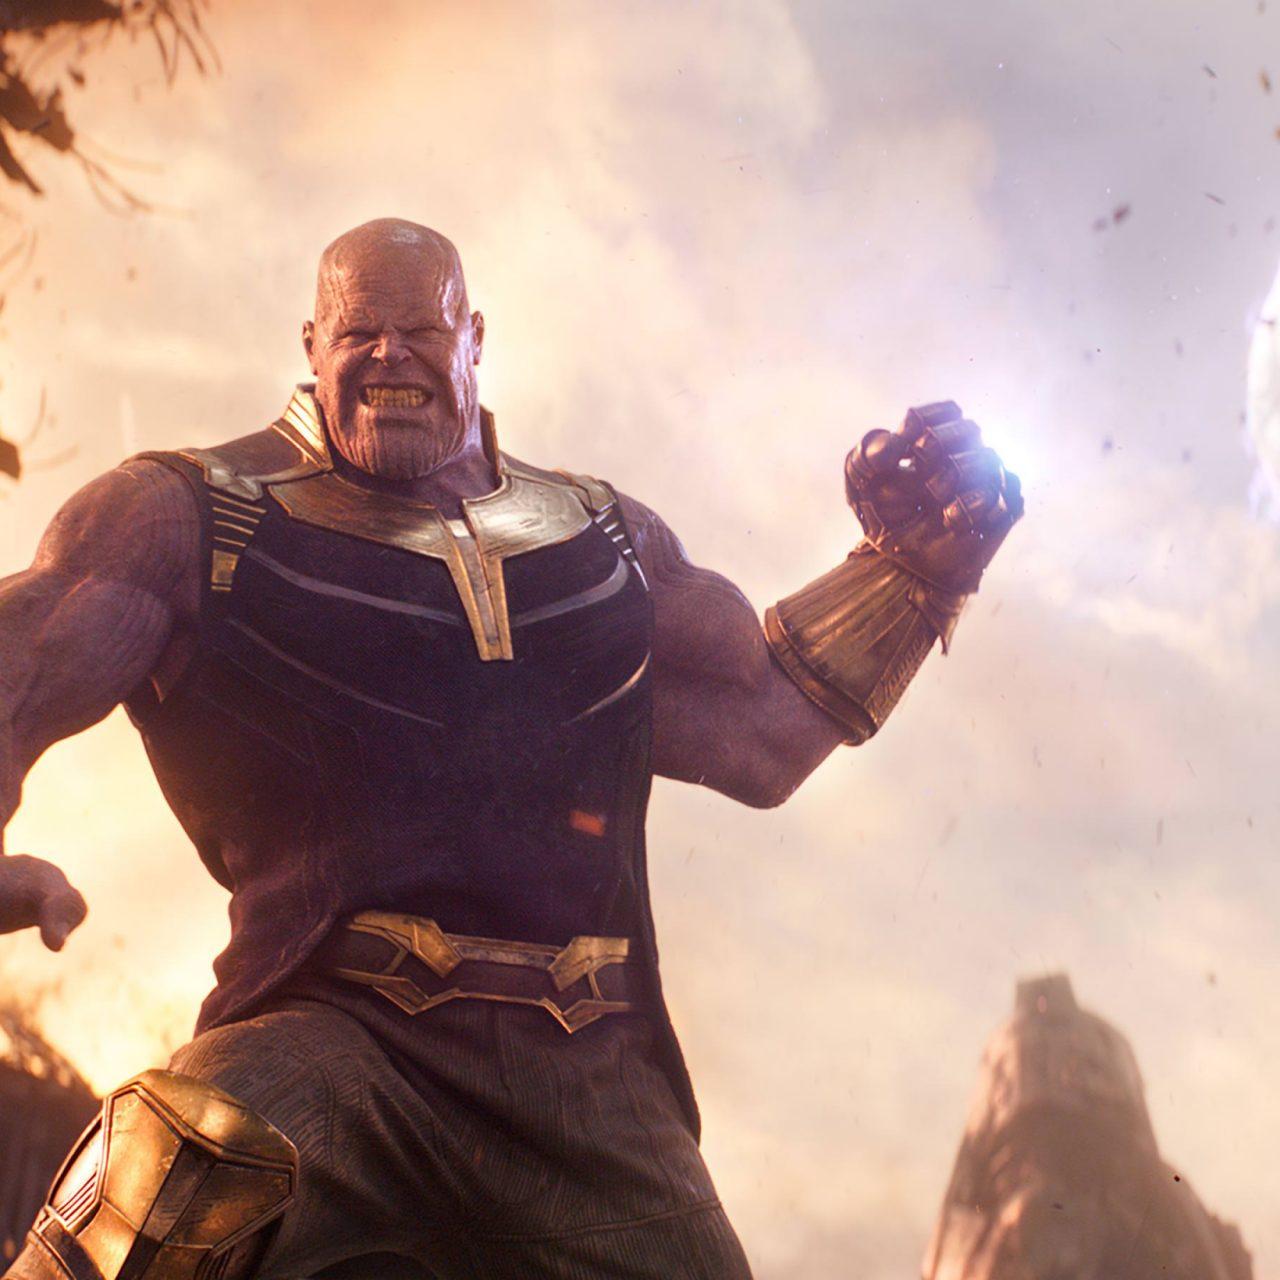 Superman Logo Wallpaper For Iphone Avengers Infinity War 2018 Thanos 4k Ultra Hd Wallpaper